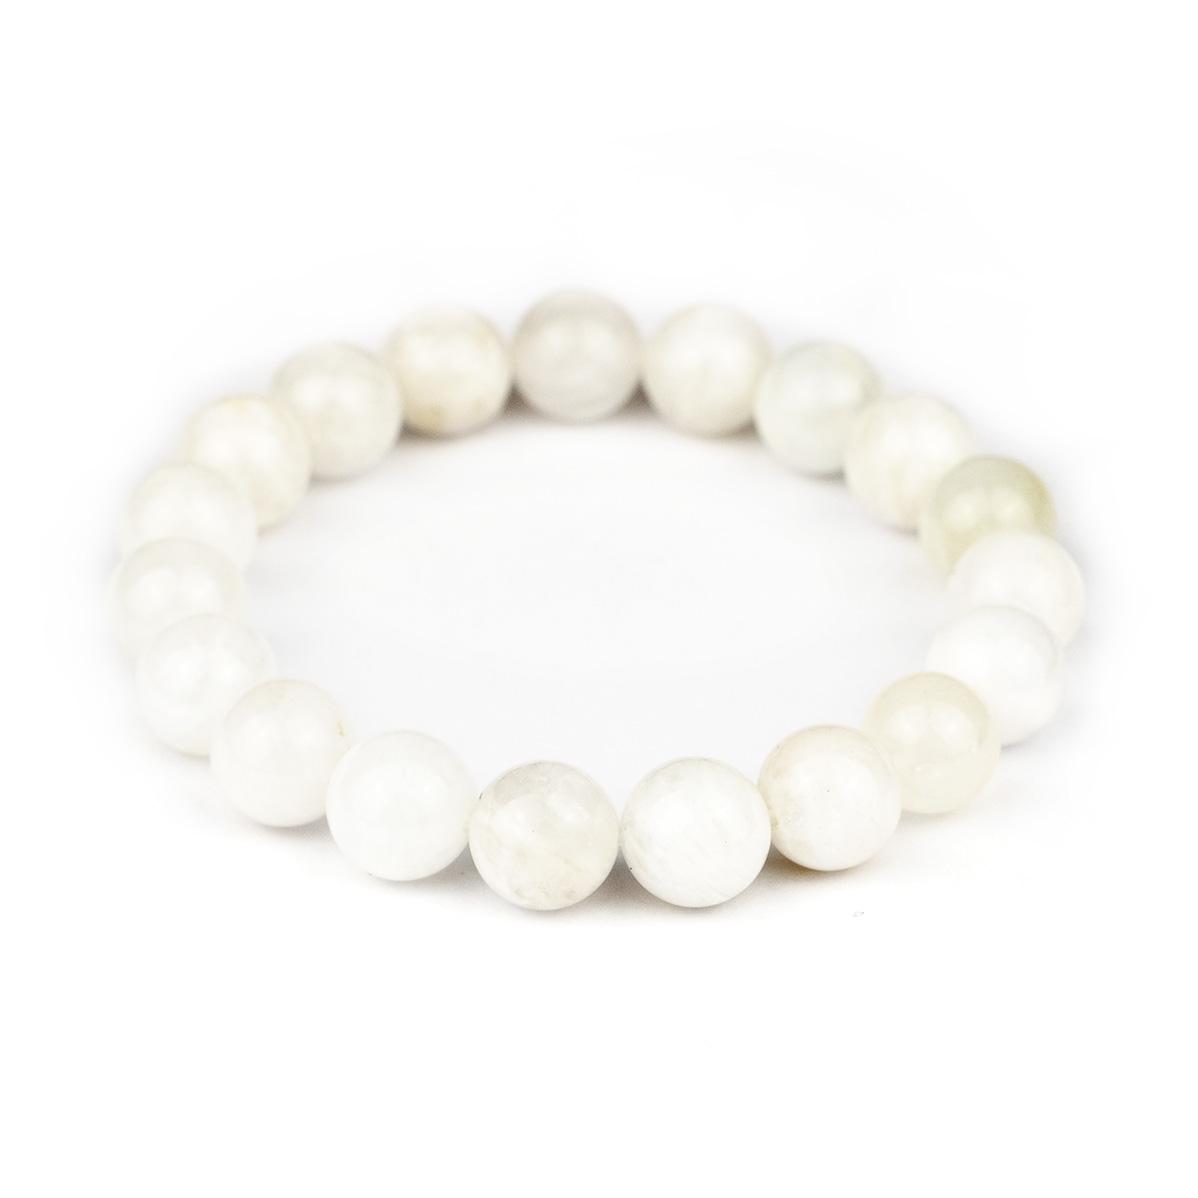 Bracelet extensible en perles de pierre de lune blanche 10mm